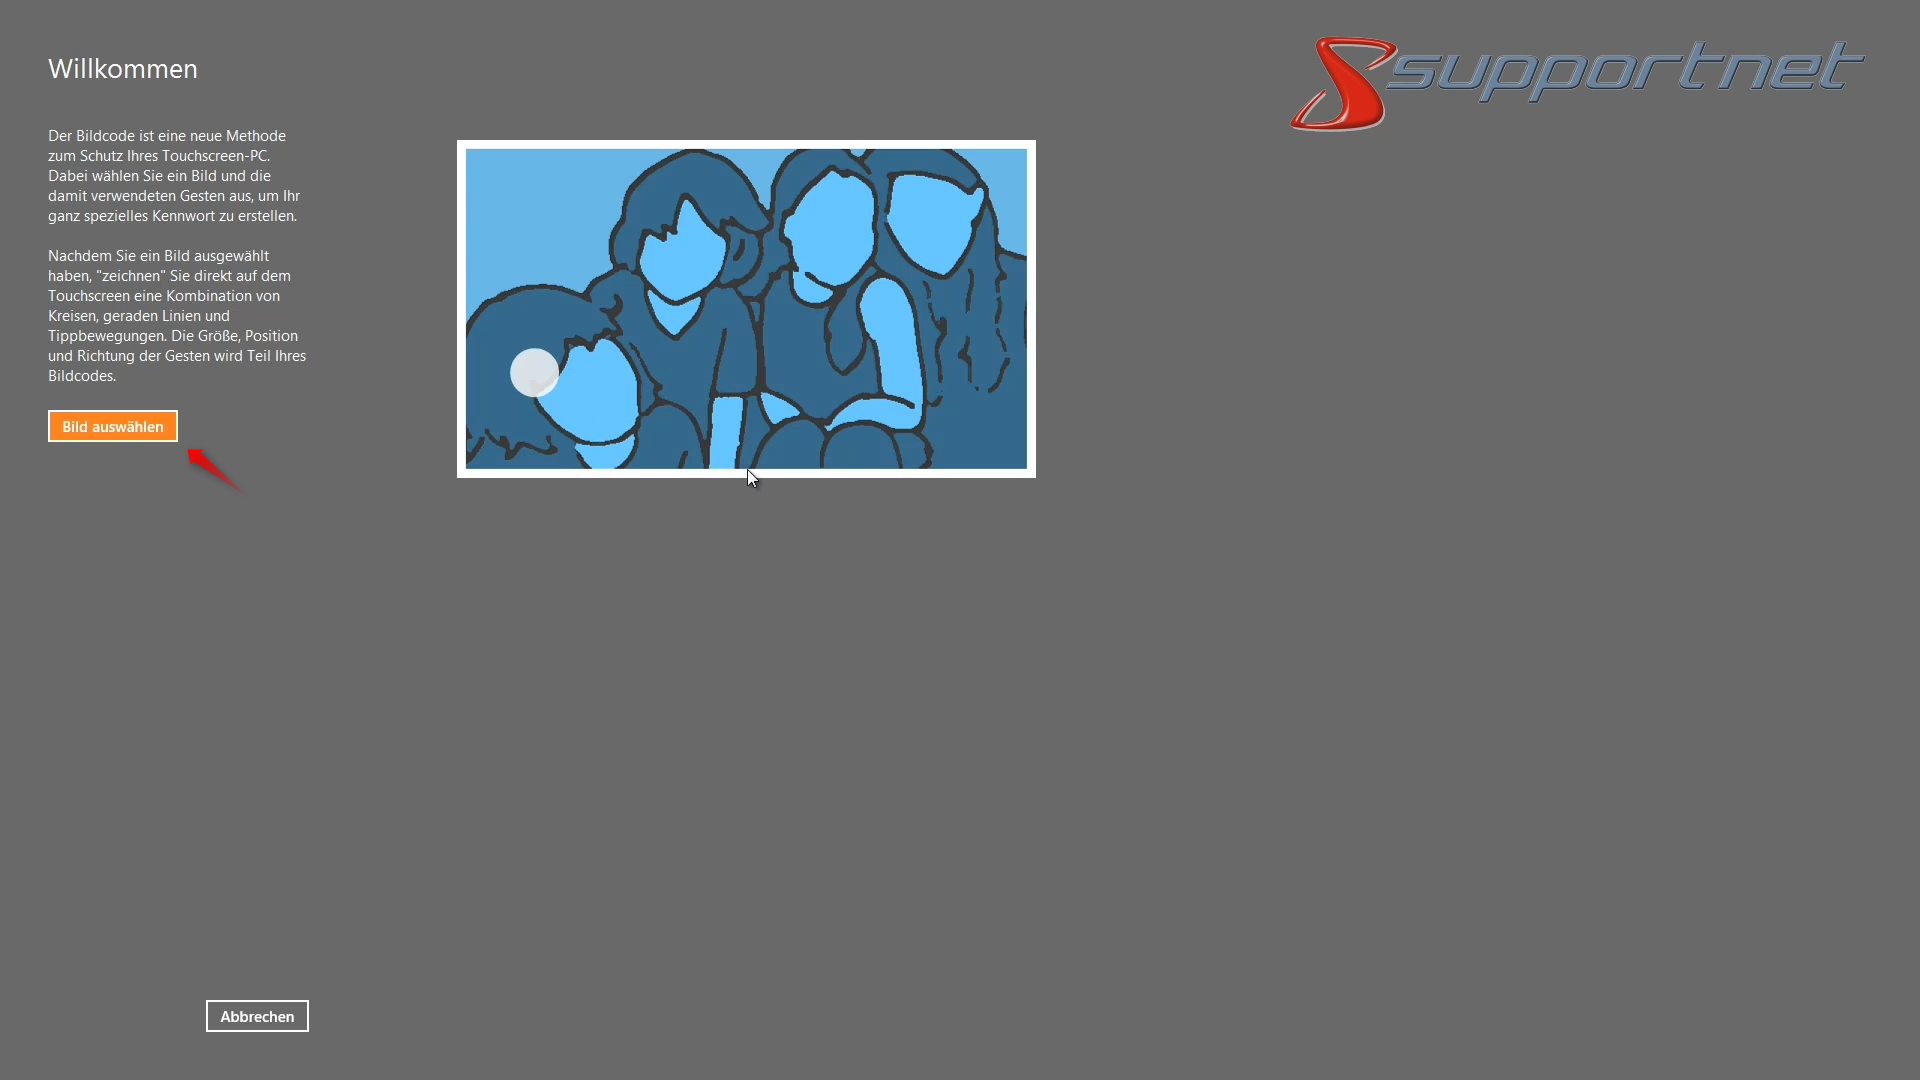 02-passwoerter-durch-bildercode-in-windows-8-ersetzen-bild-auswaehlen-470.png?nocache=1331035421851